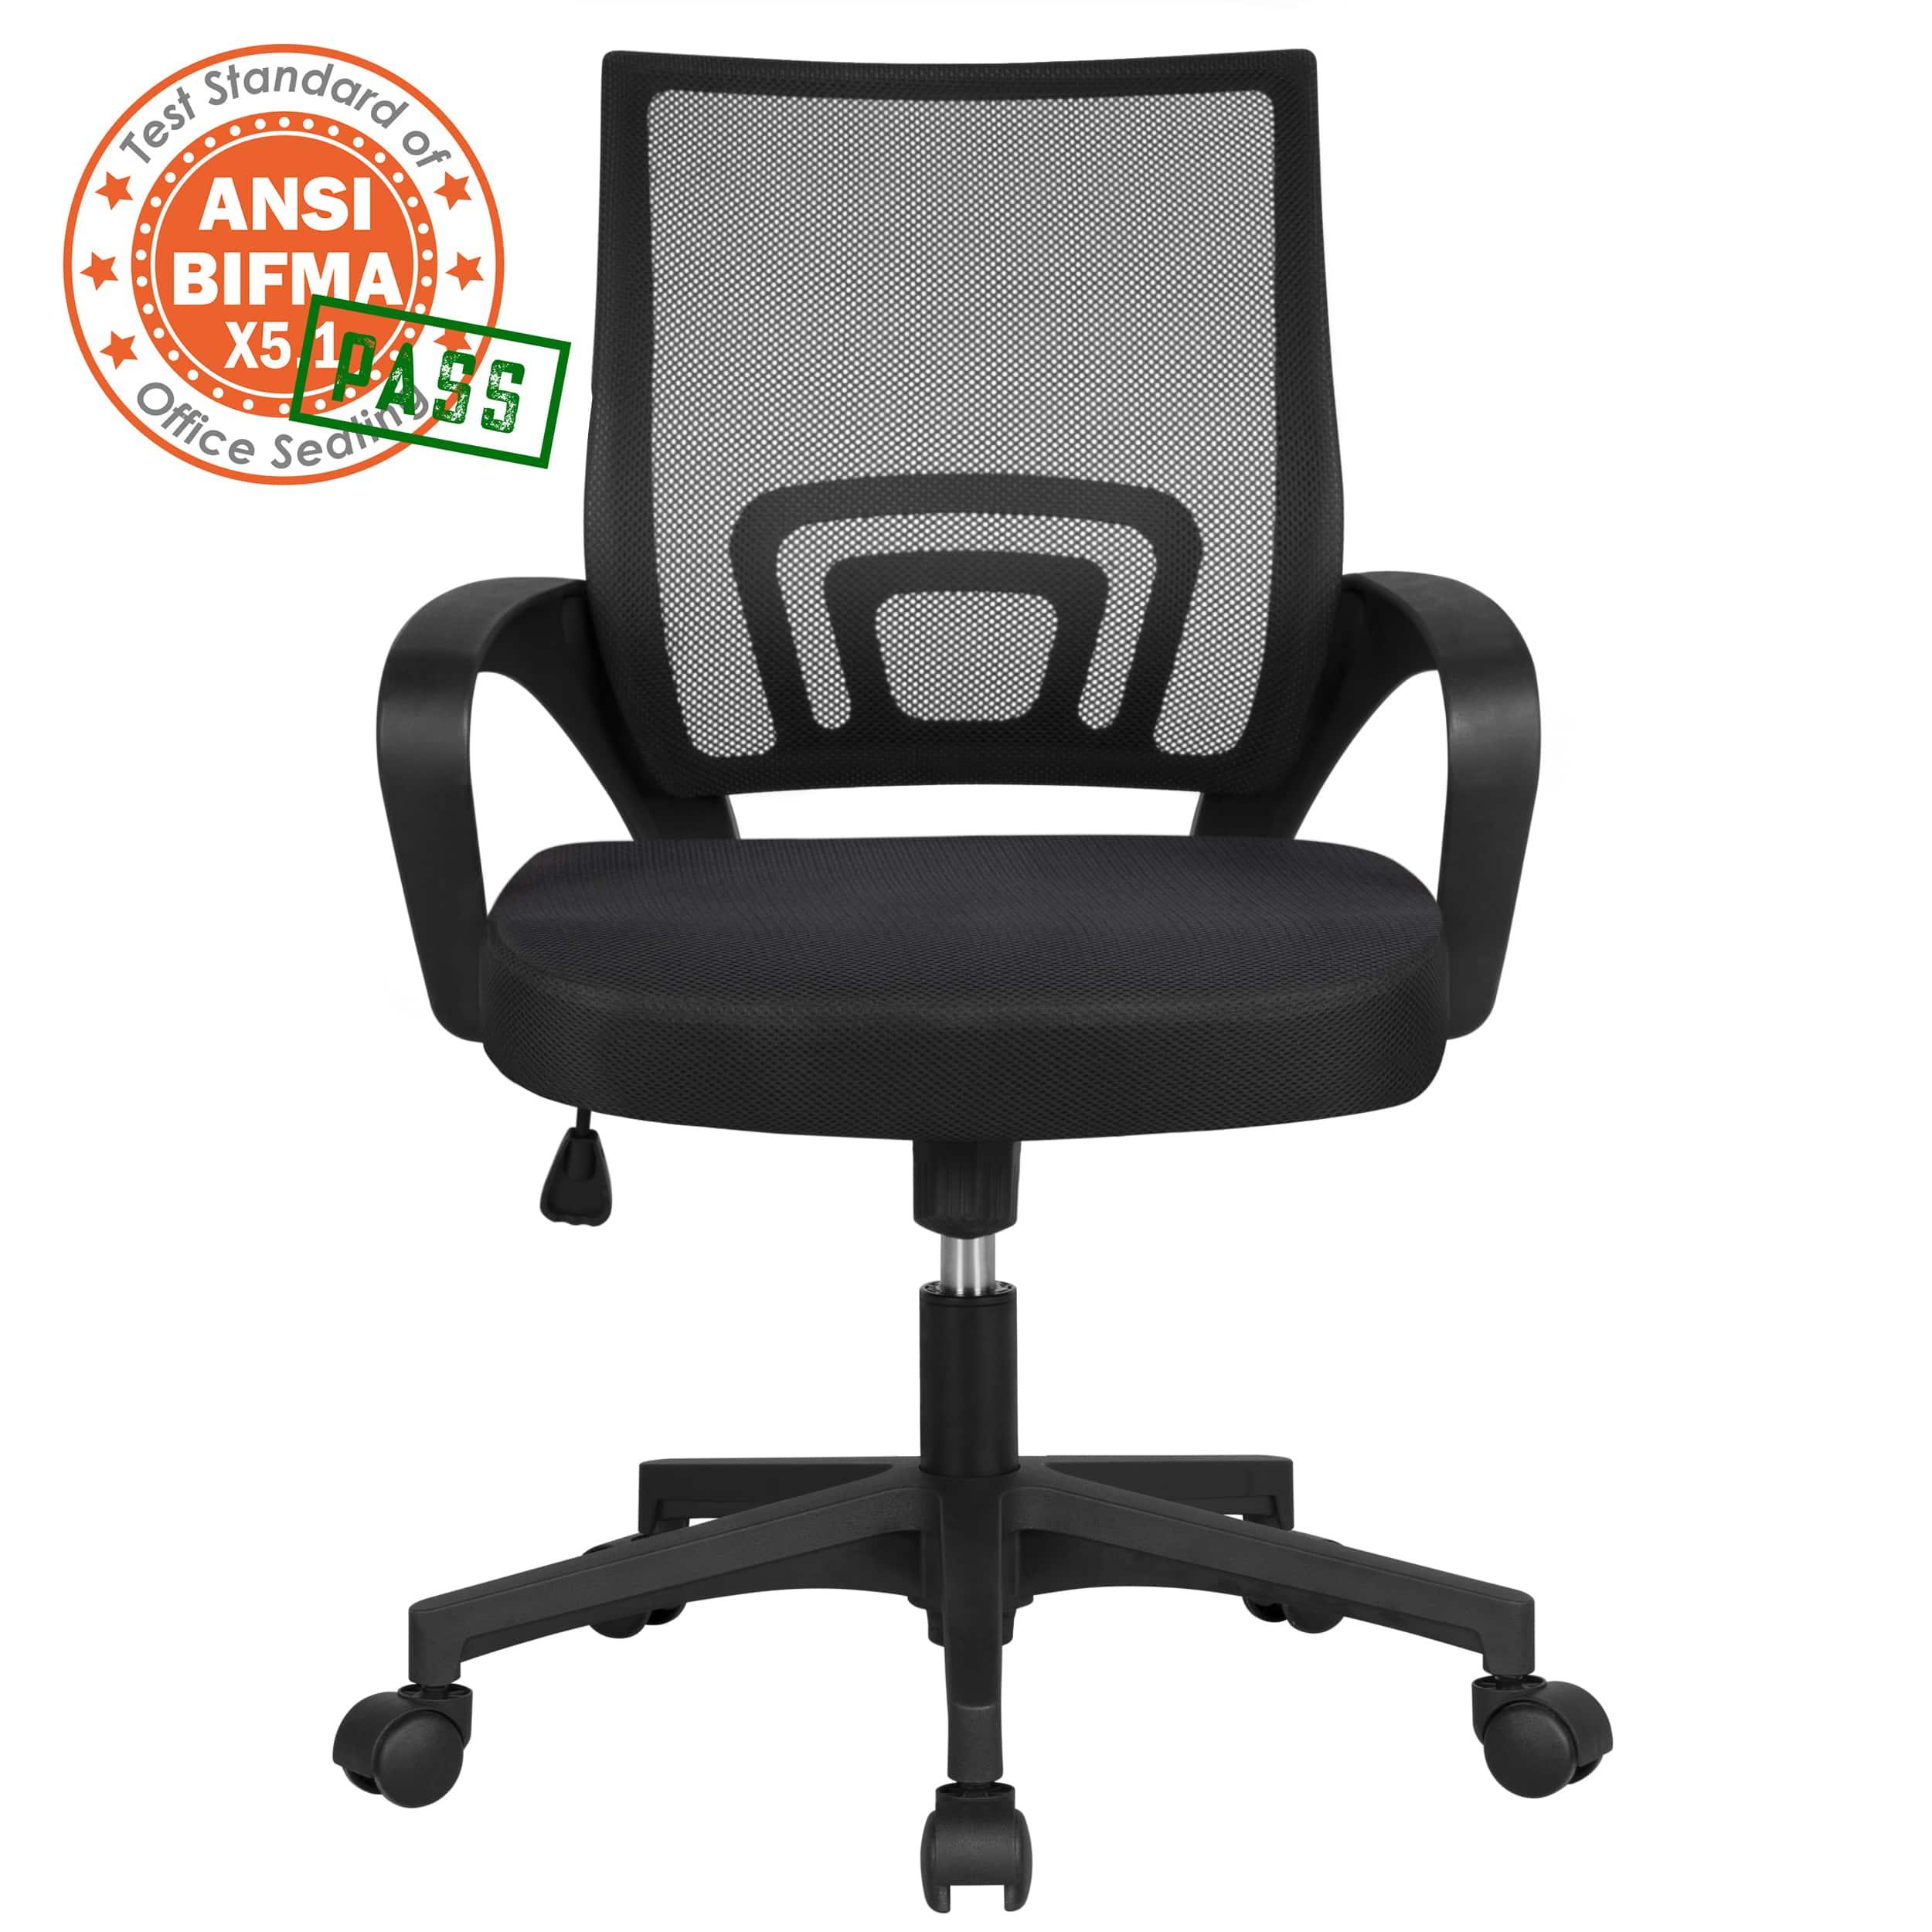 Yaheetech Office Computer Mesh Chair $47.99 + Free Shipping